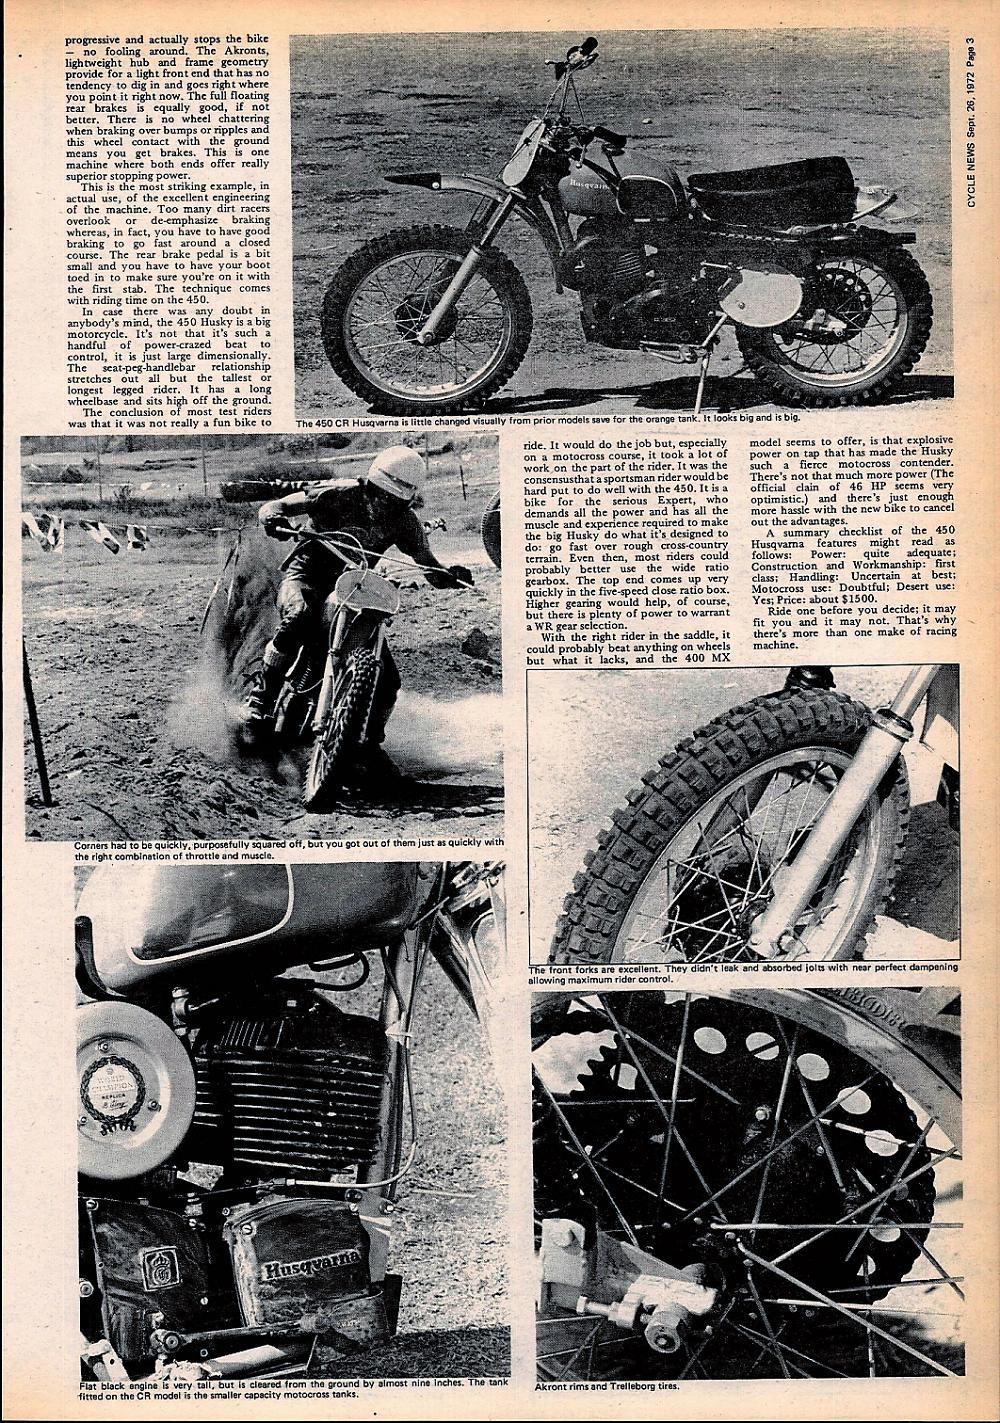 1972 Husqvarna 450 CR road test.2.jpg